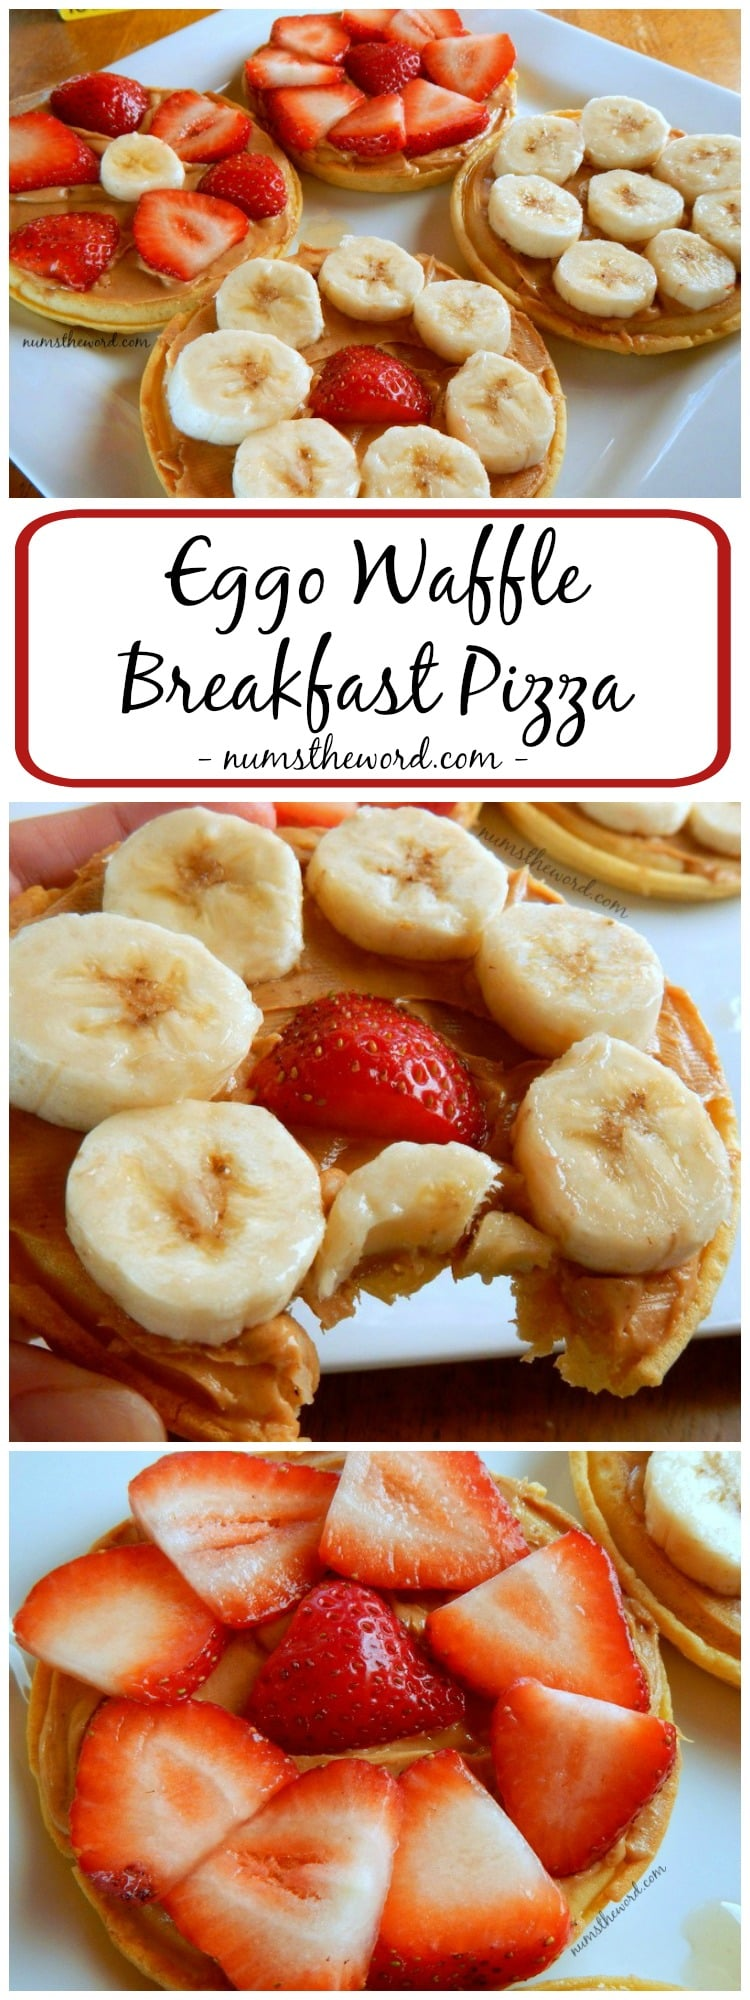 Eggo Waffle Breakfast Pizza